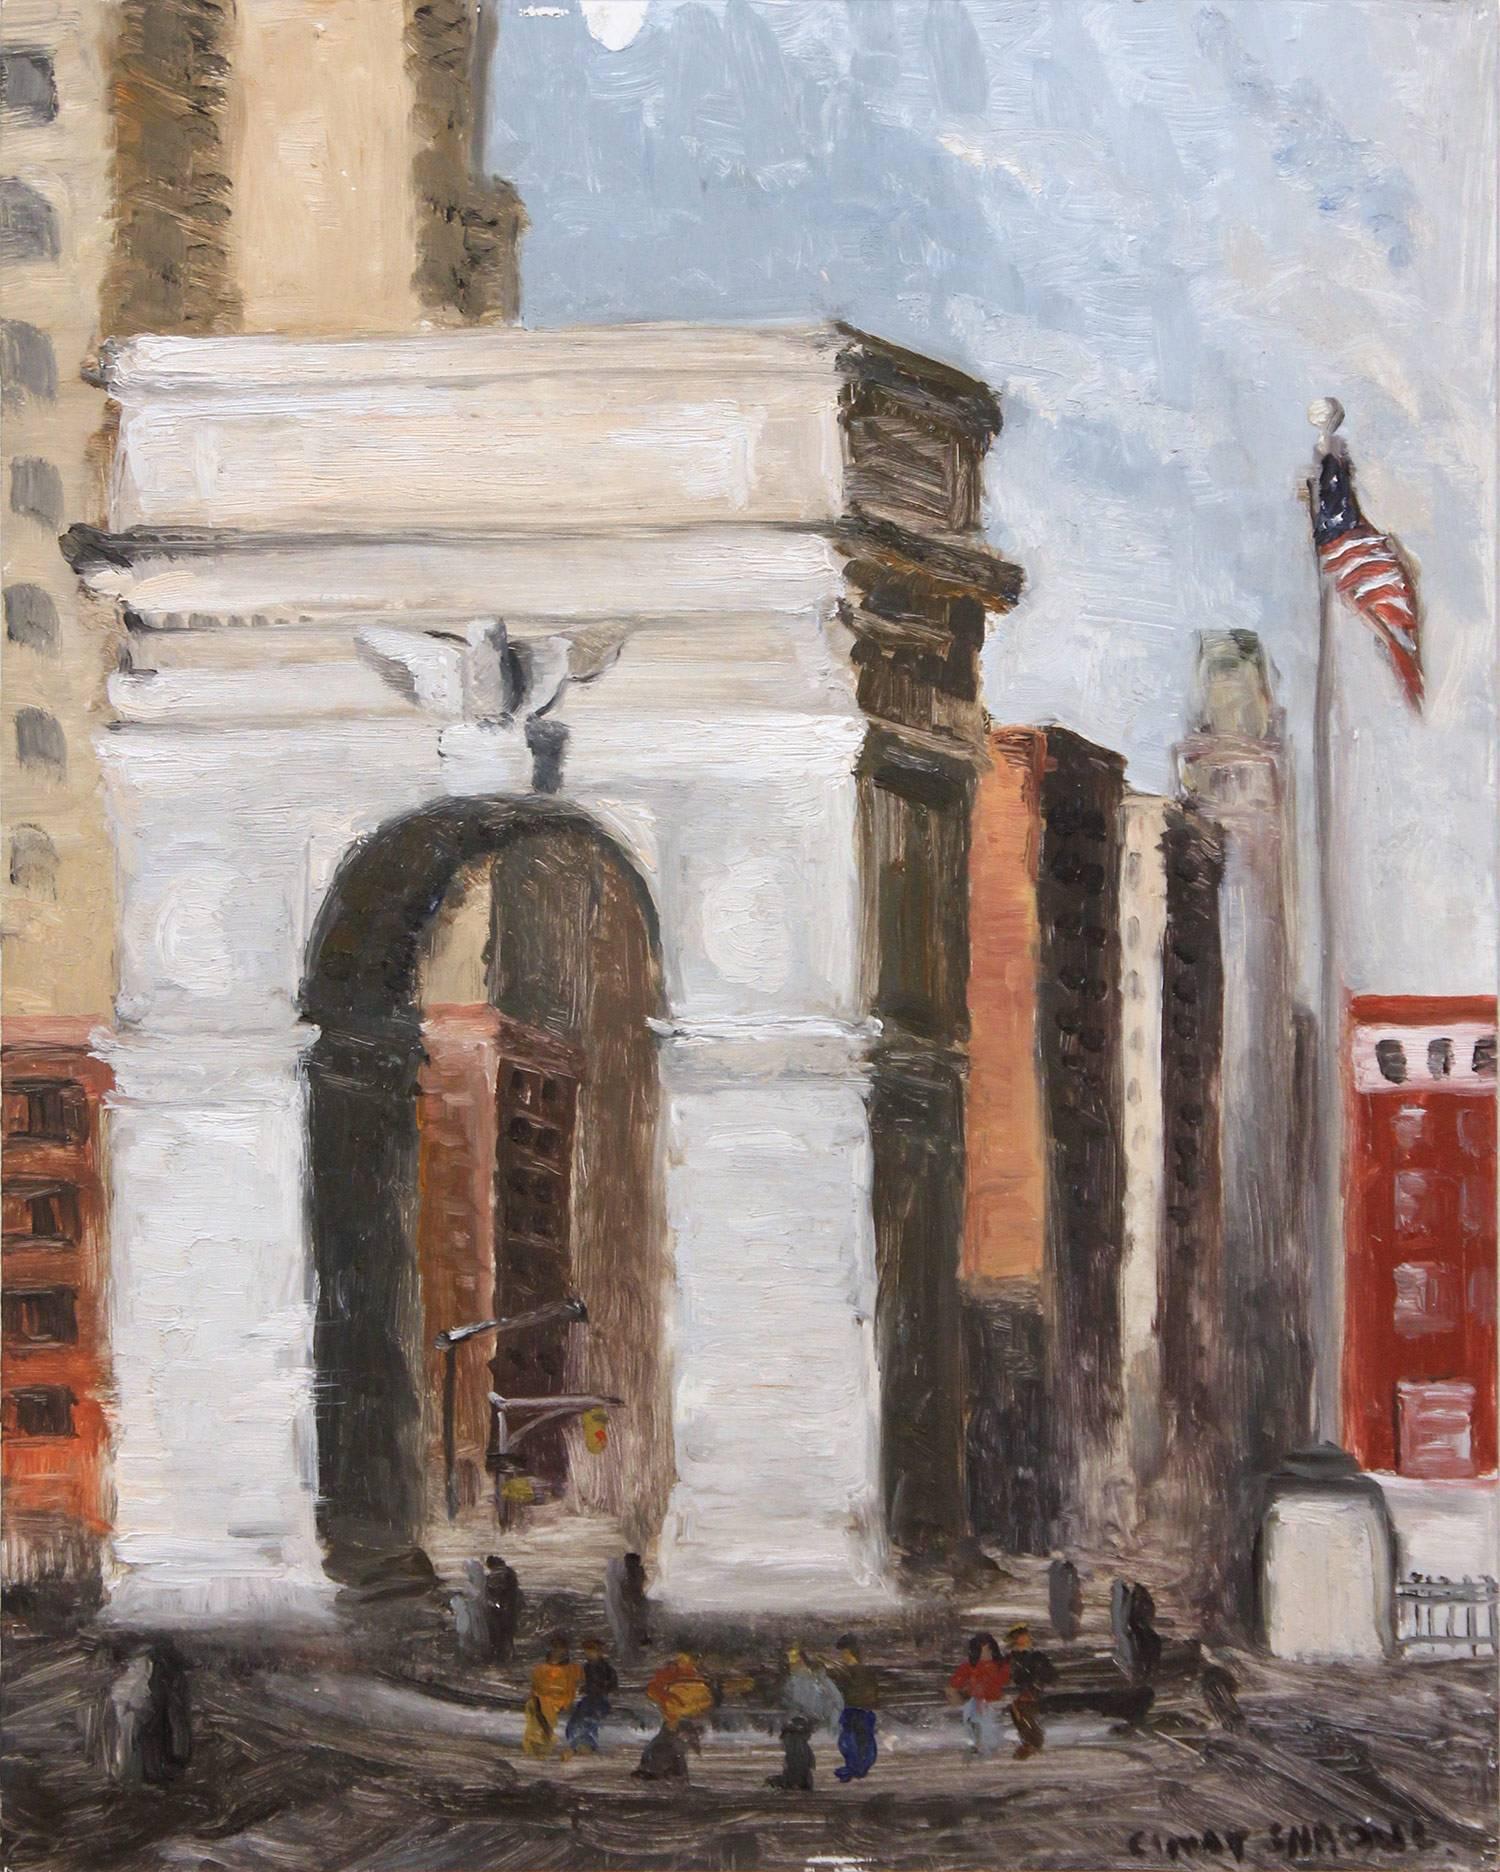 """Hanging out at Washington Square Park"" Impressionist New York City Scene"